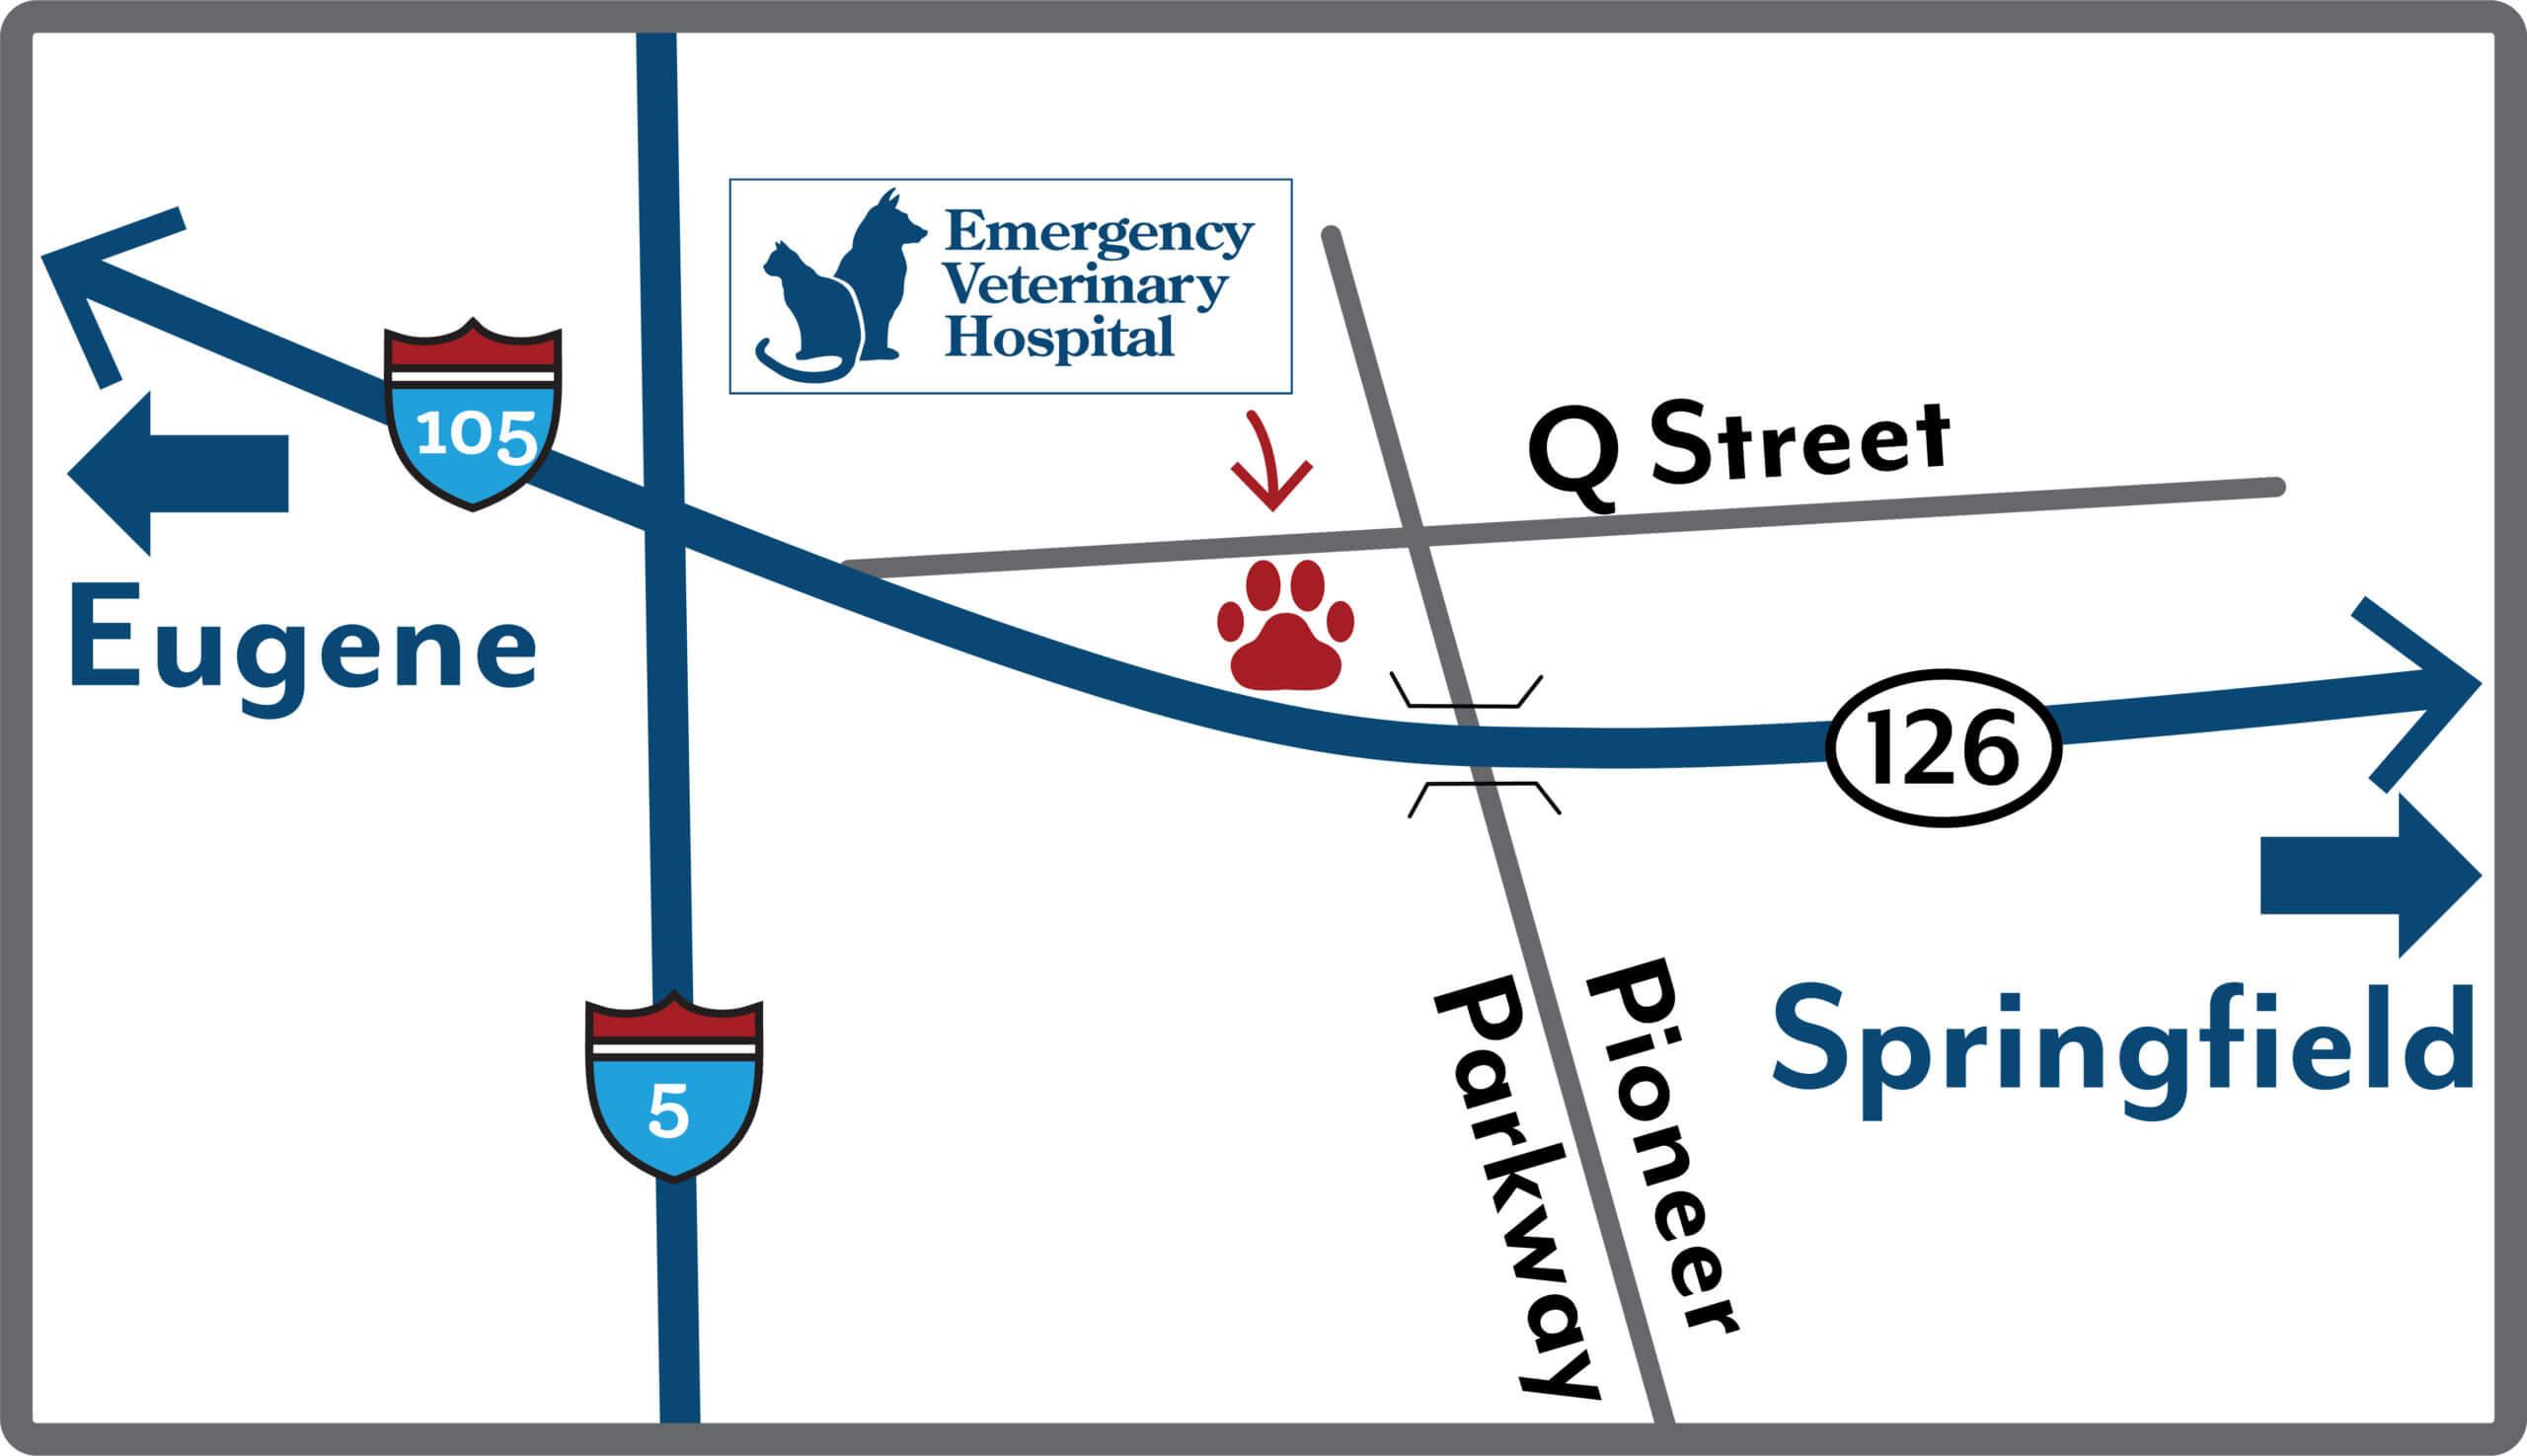 Emergency Veterinary Hospital map